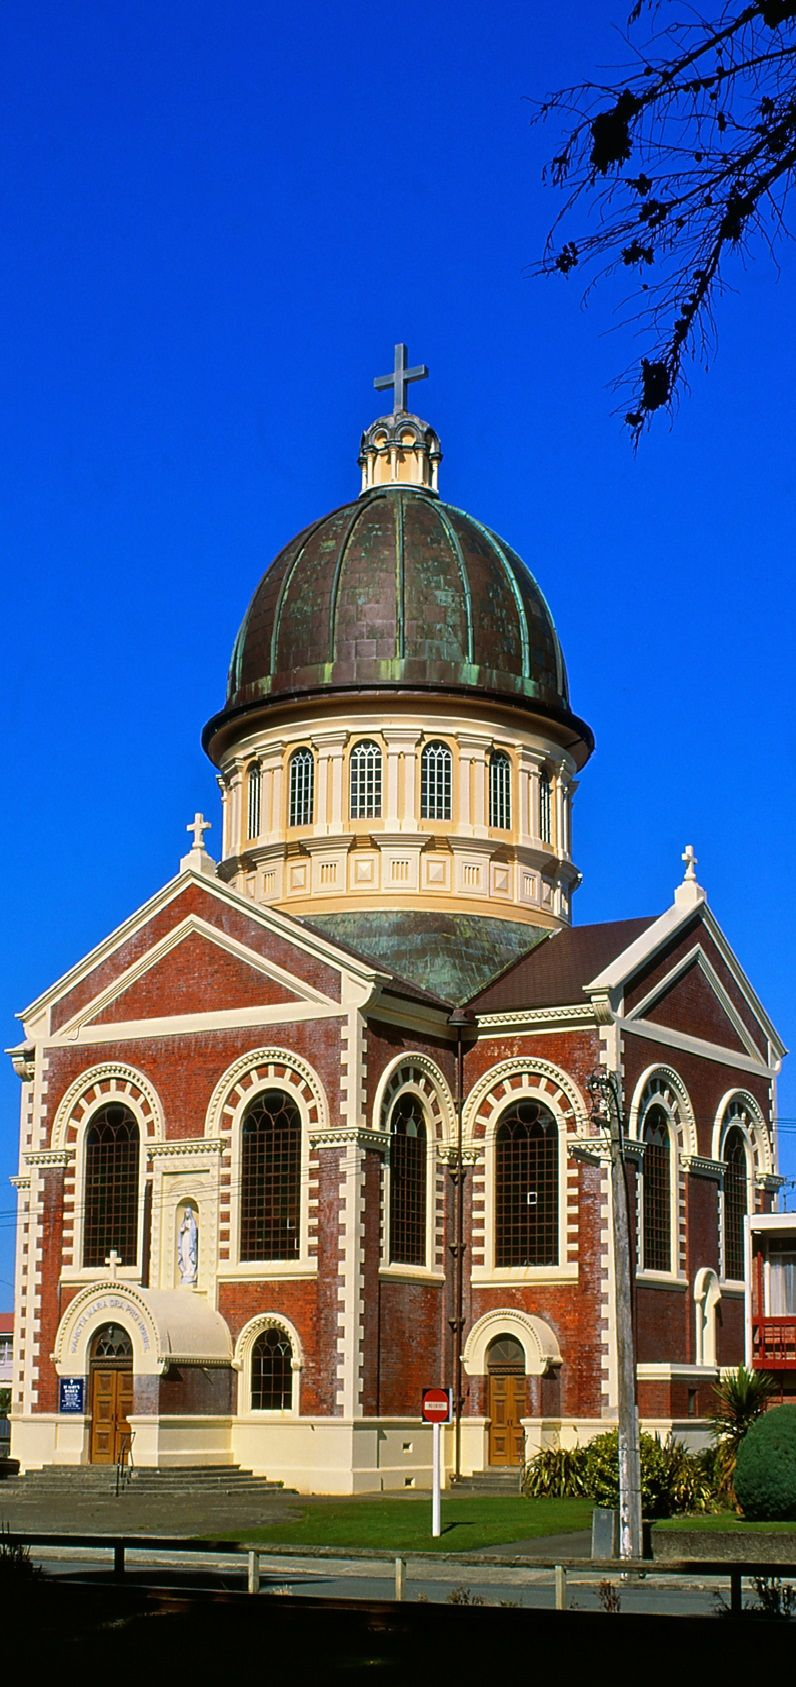 St Mary's Roman Catholic Basilica, Invercargill, New Zealand